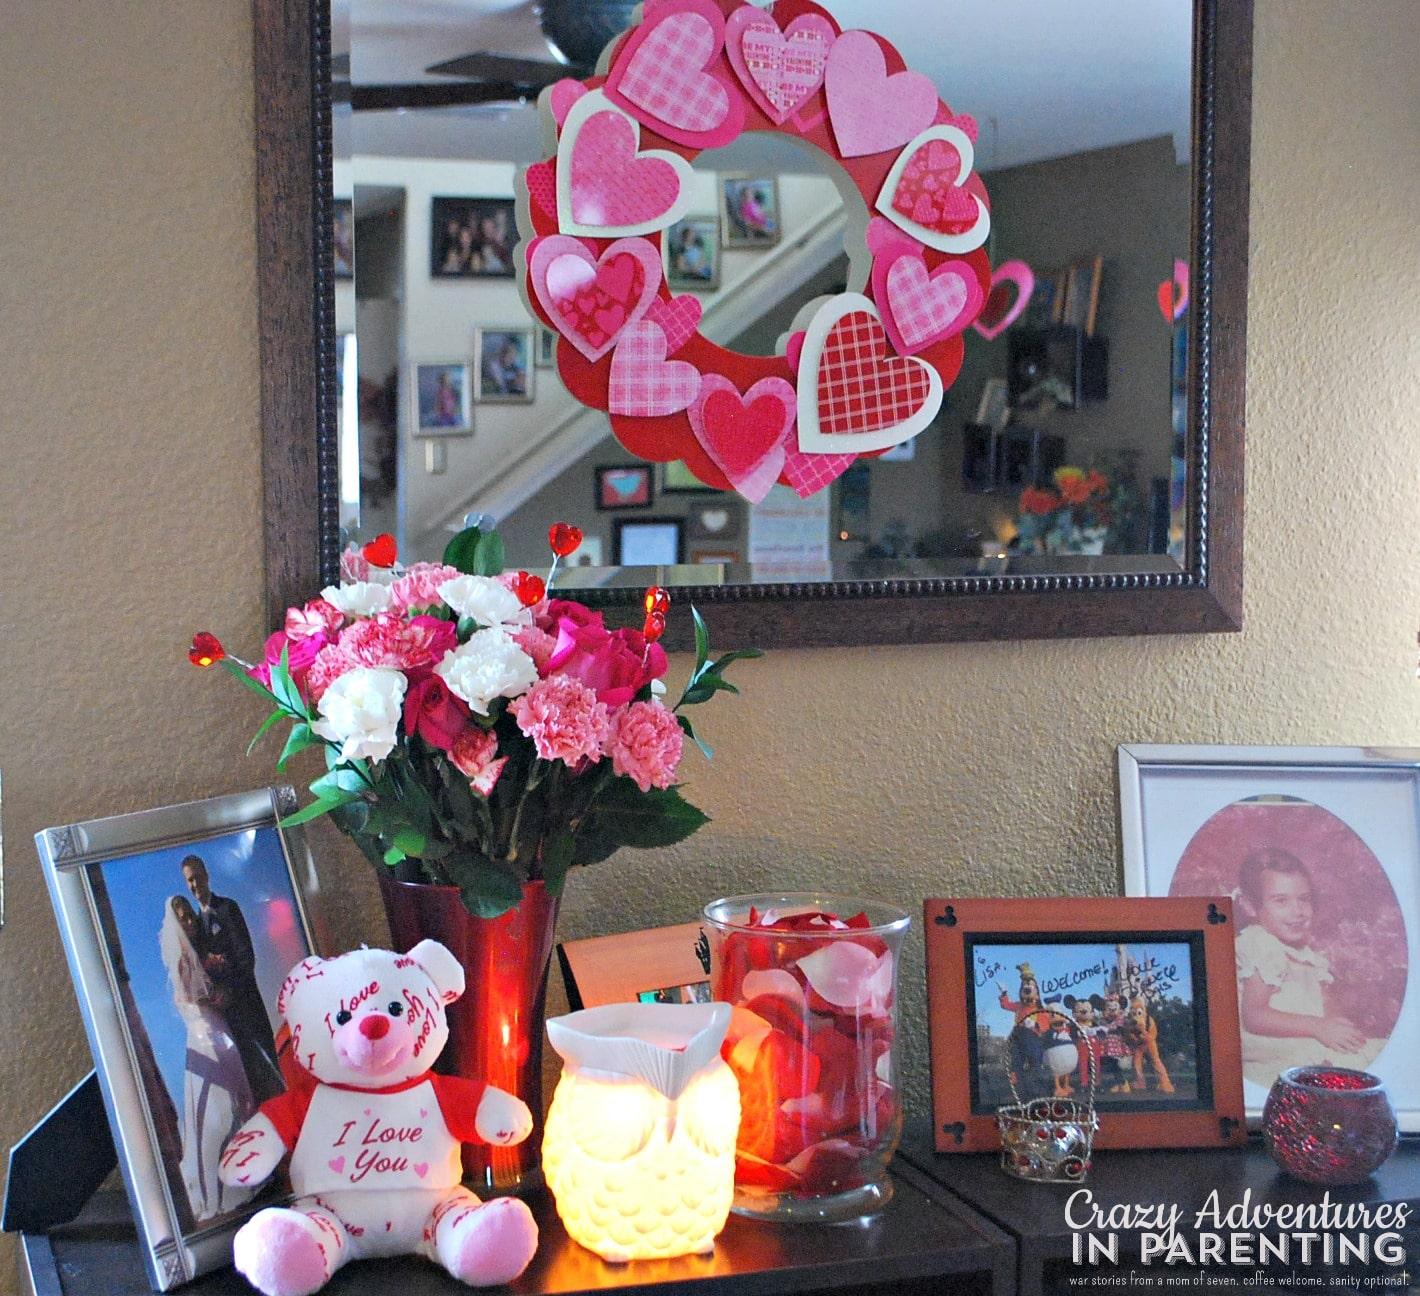 Proflowers Valentine's flowers